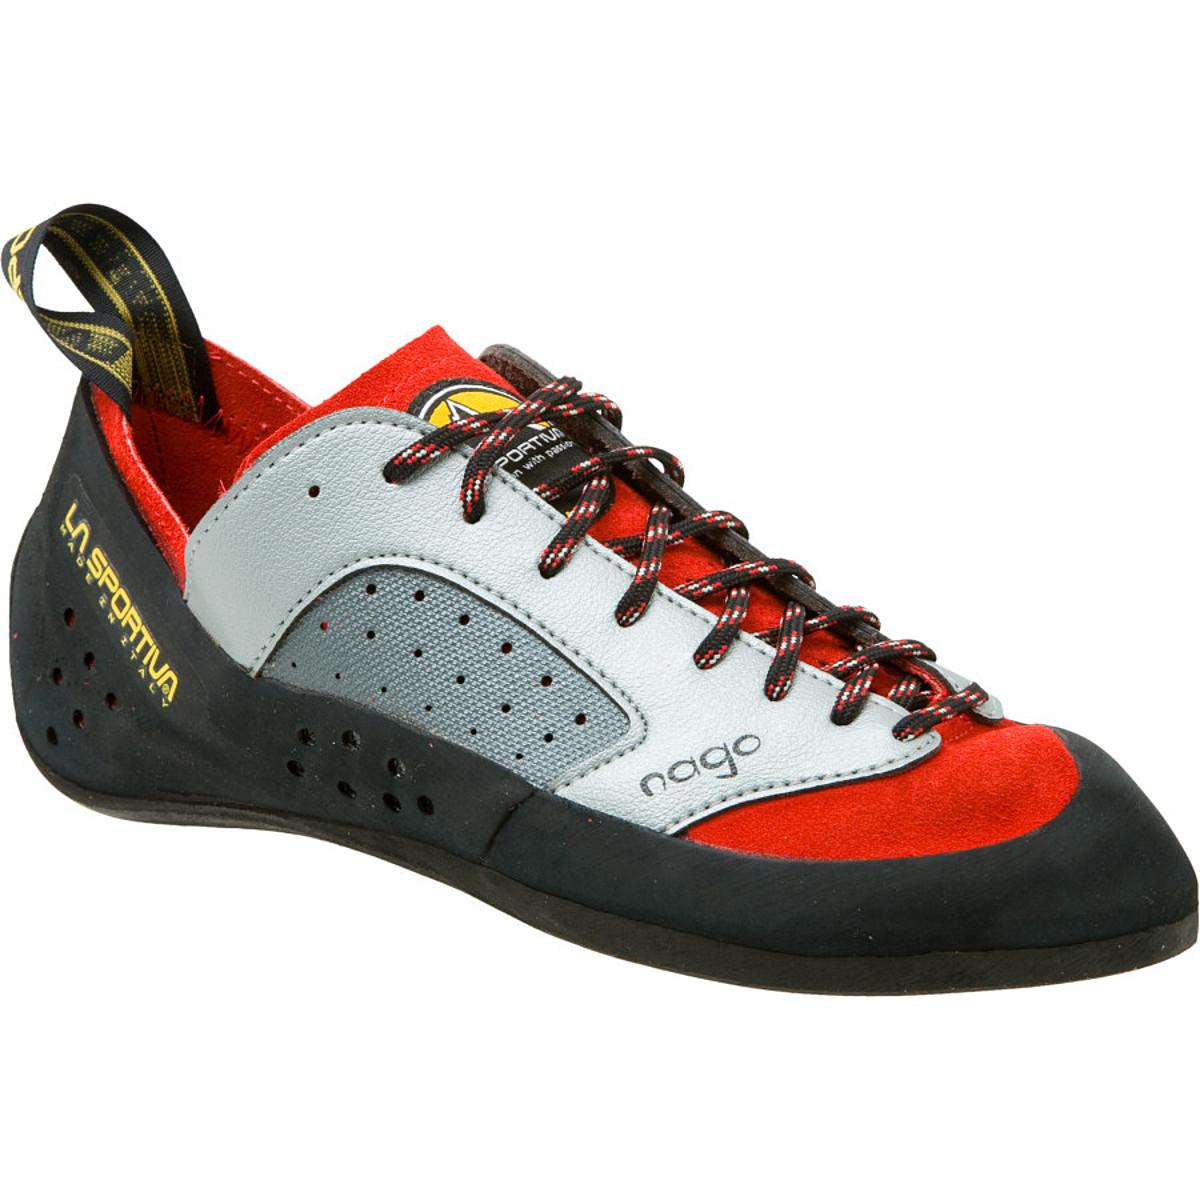 photo: La Sportiva Men's Nago climbing shoe